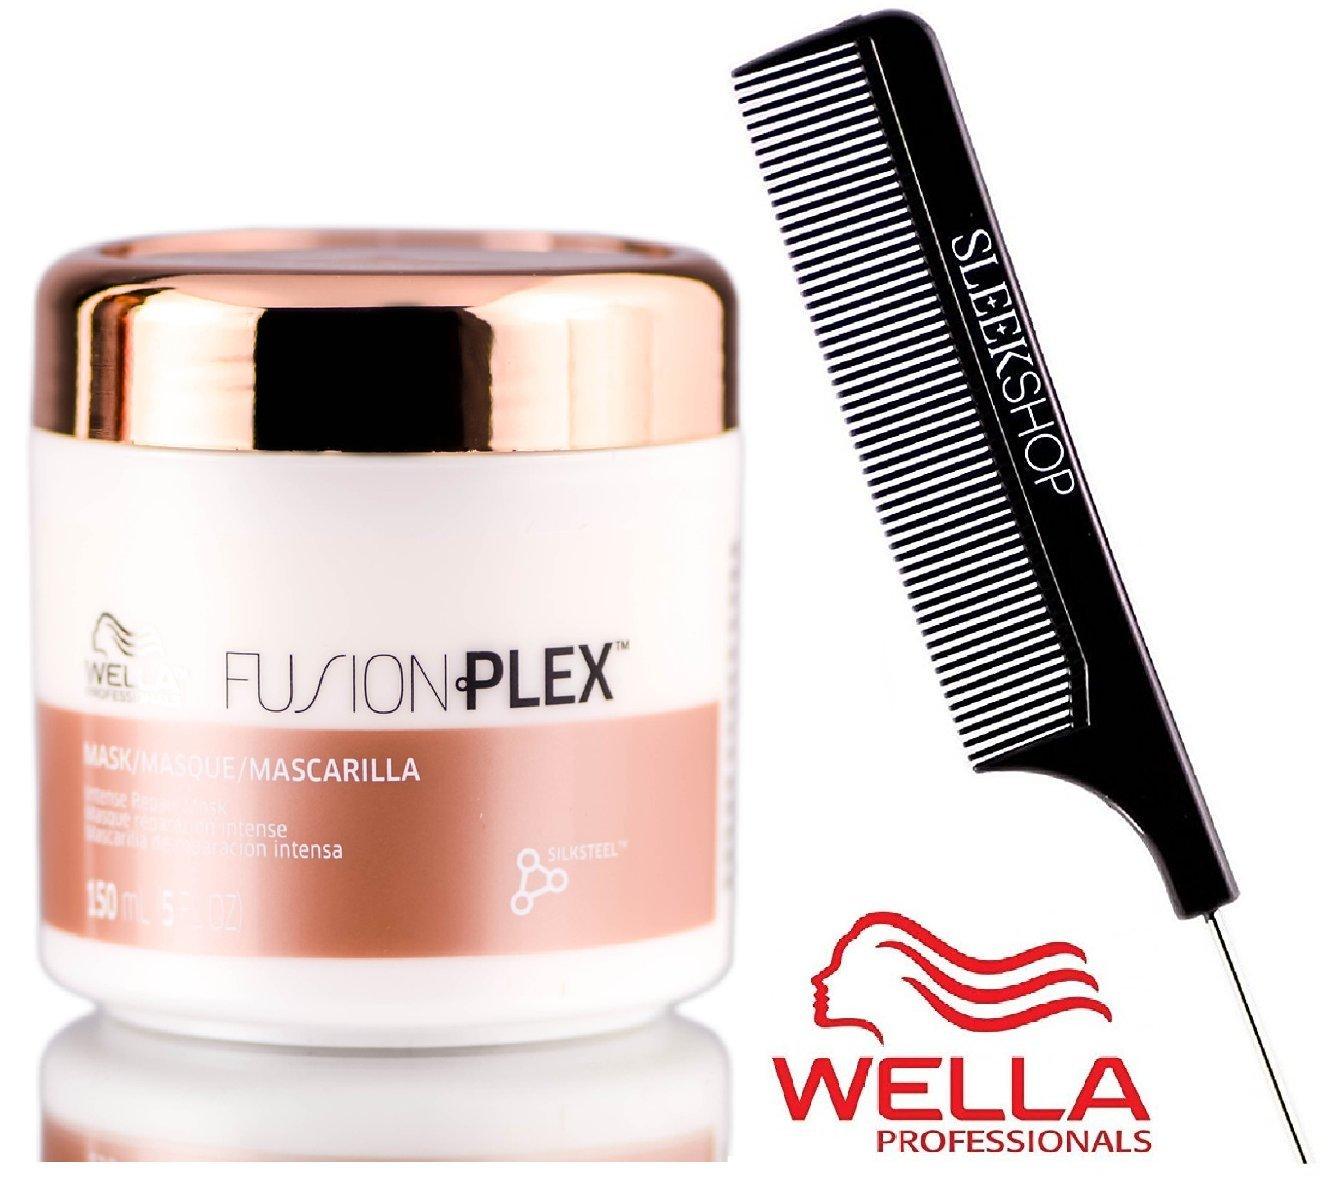 Wella FUSION PLEX Intense Repair Mask with Sleek Steel Pin Tail Comb 16.9 oz 500 ml – LARGE